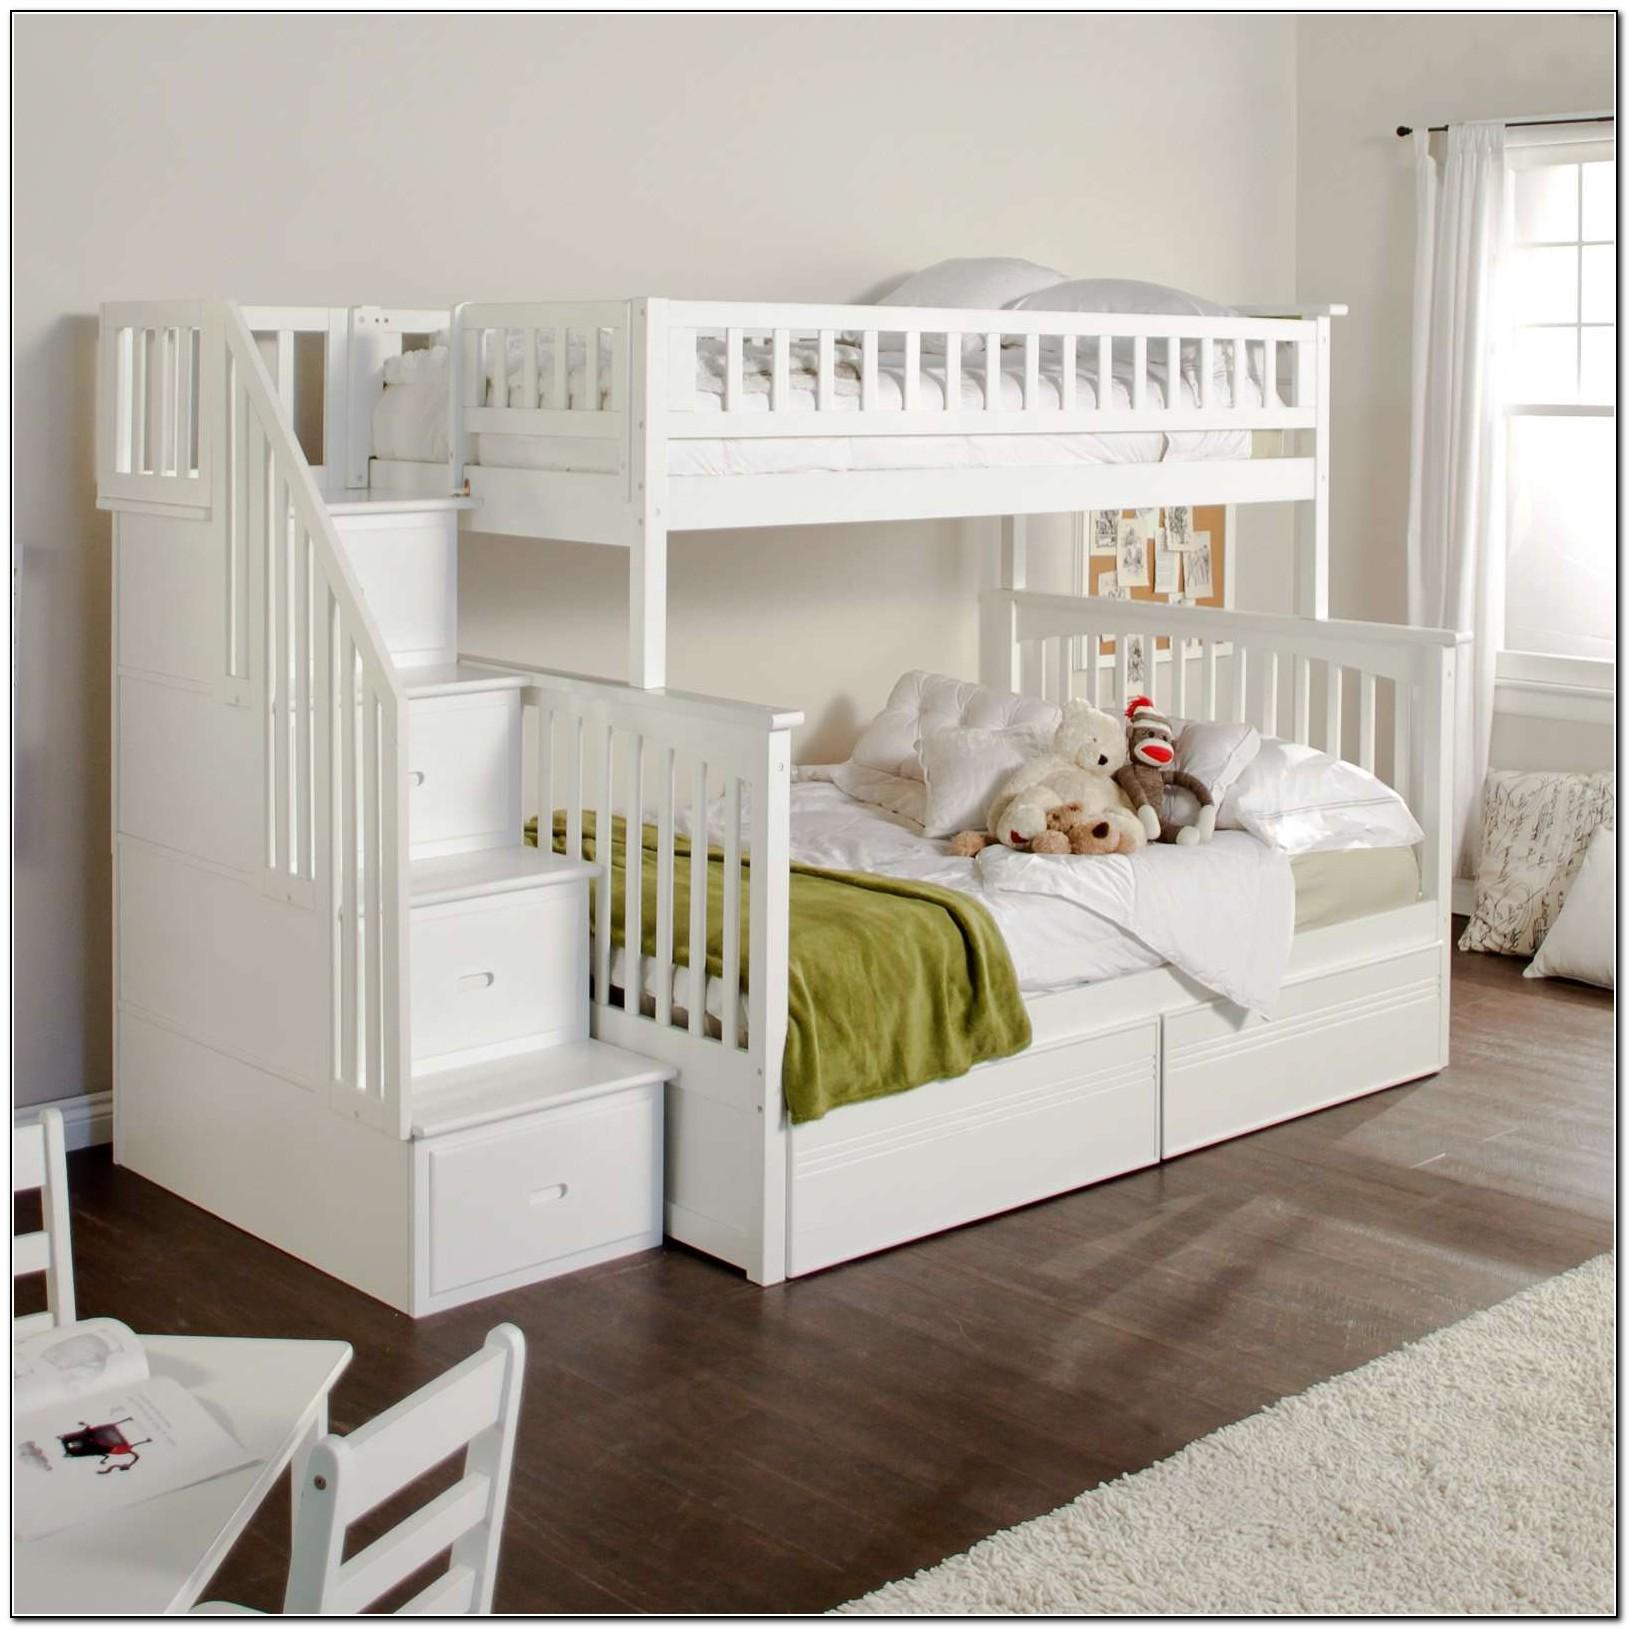 Ikea Kids Beds Perth